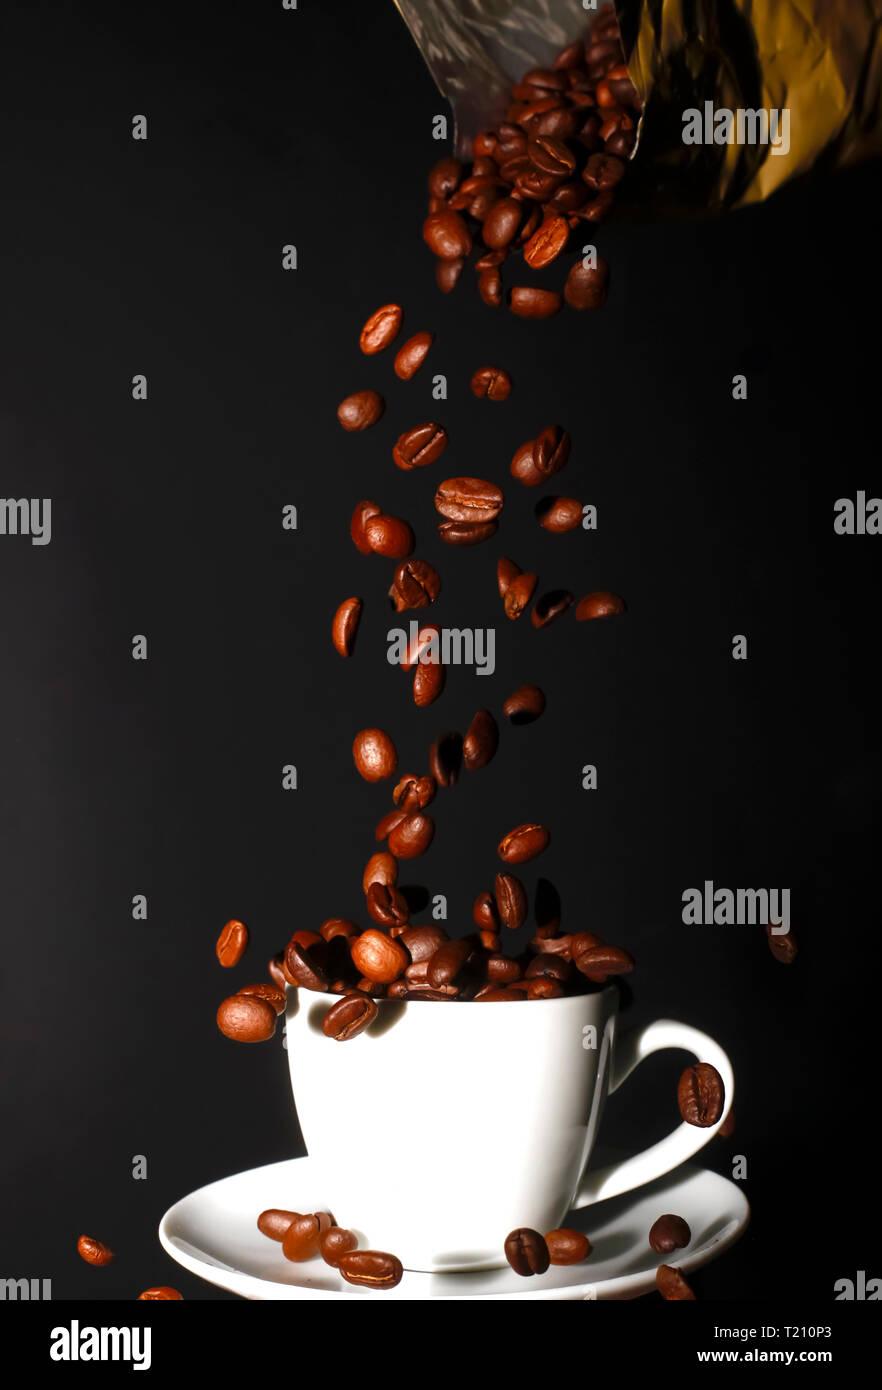 Espresso beans and espresso cup - Stock Image